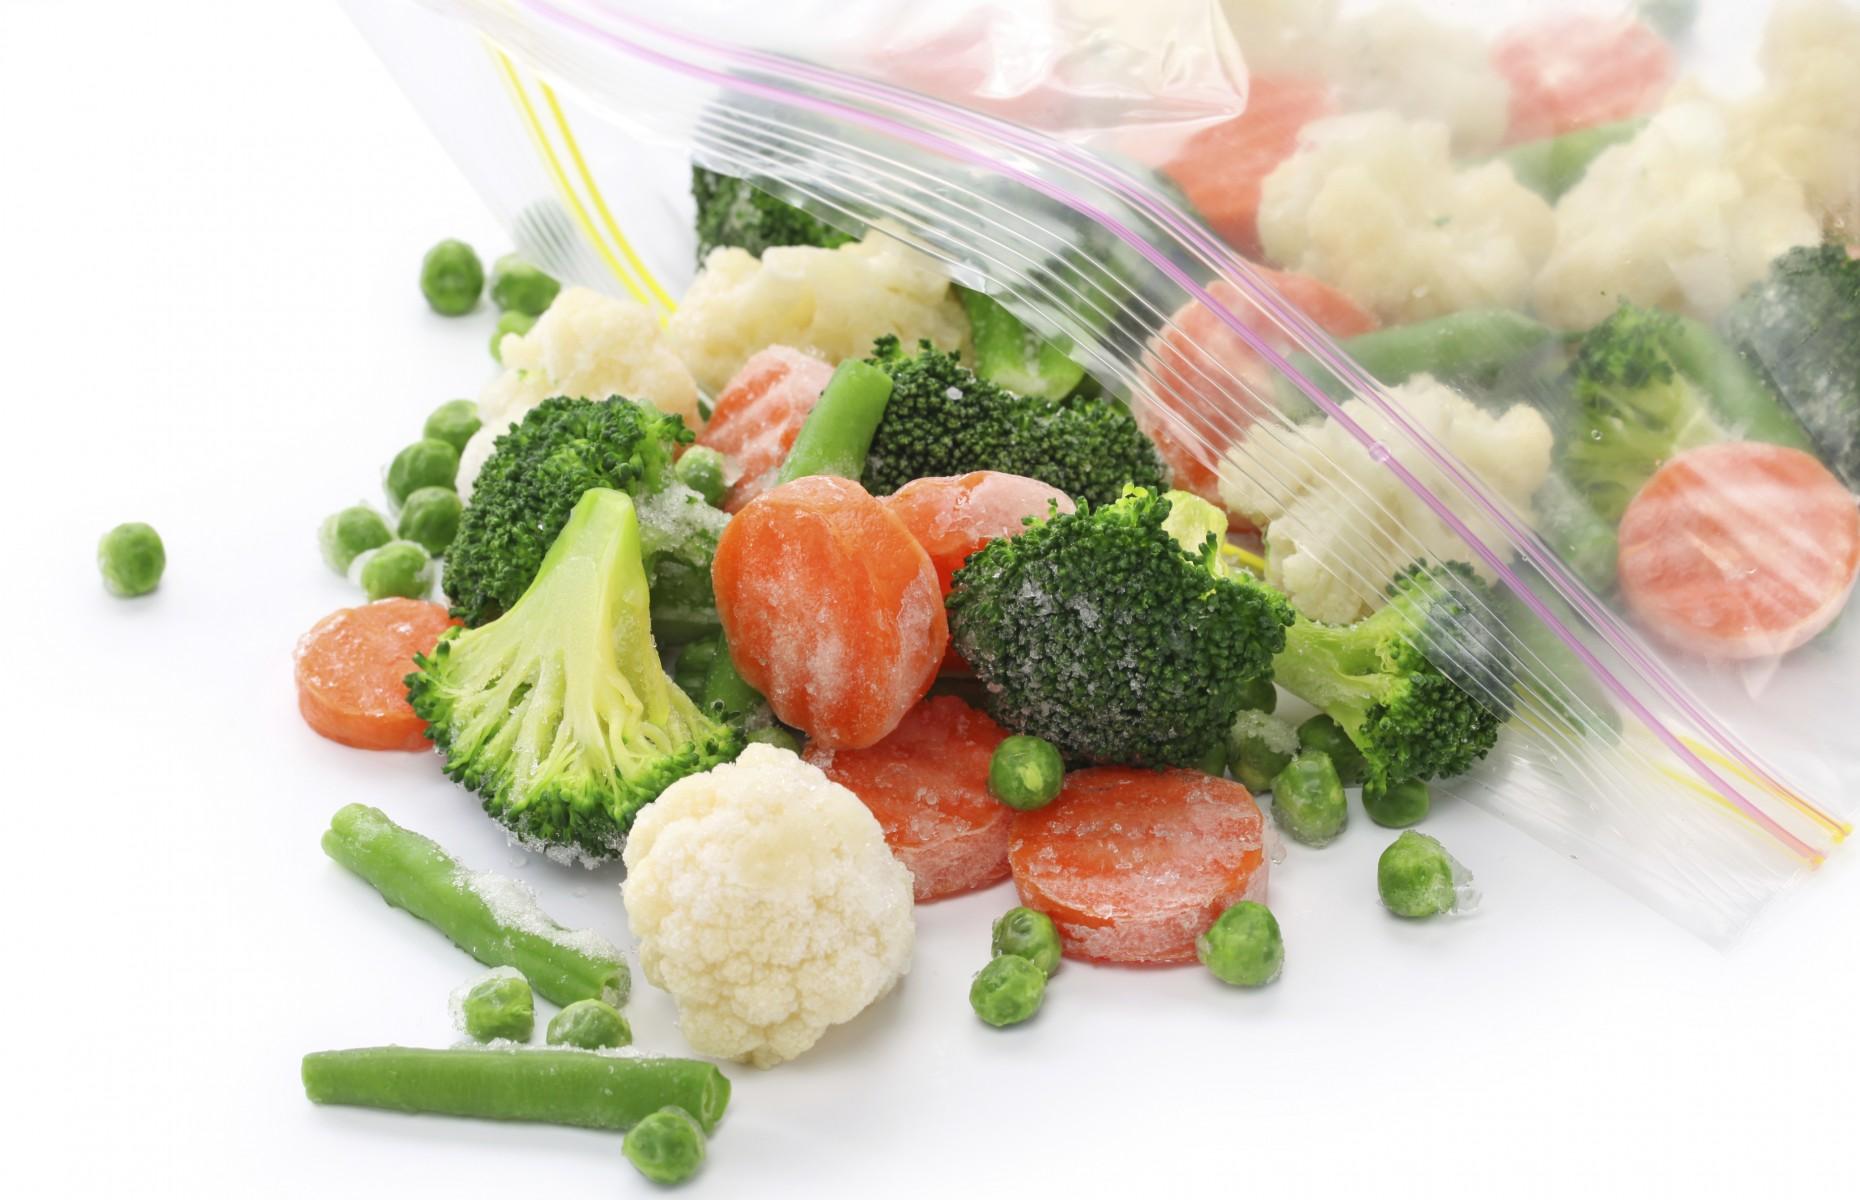 Congelar vegetais e excelente para a saúde e evita despedício de alimentos